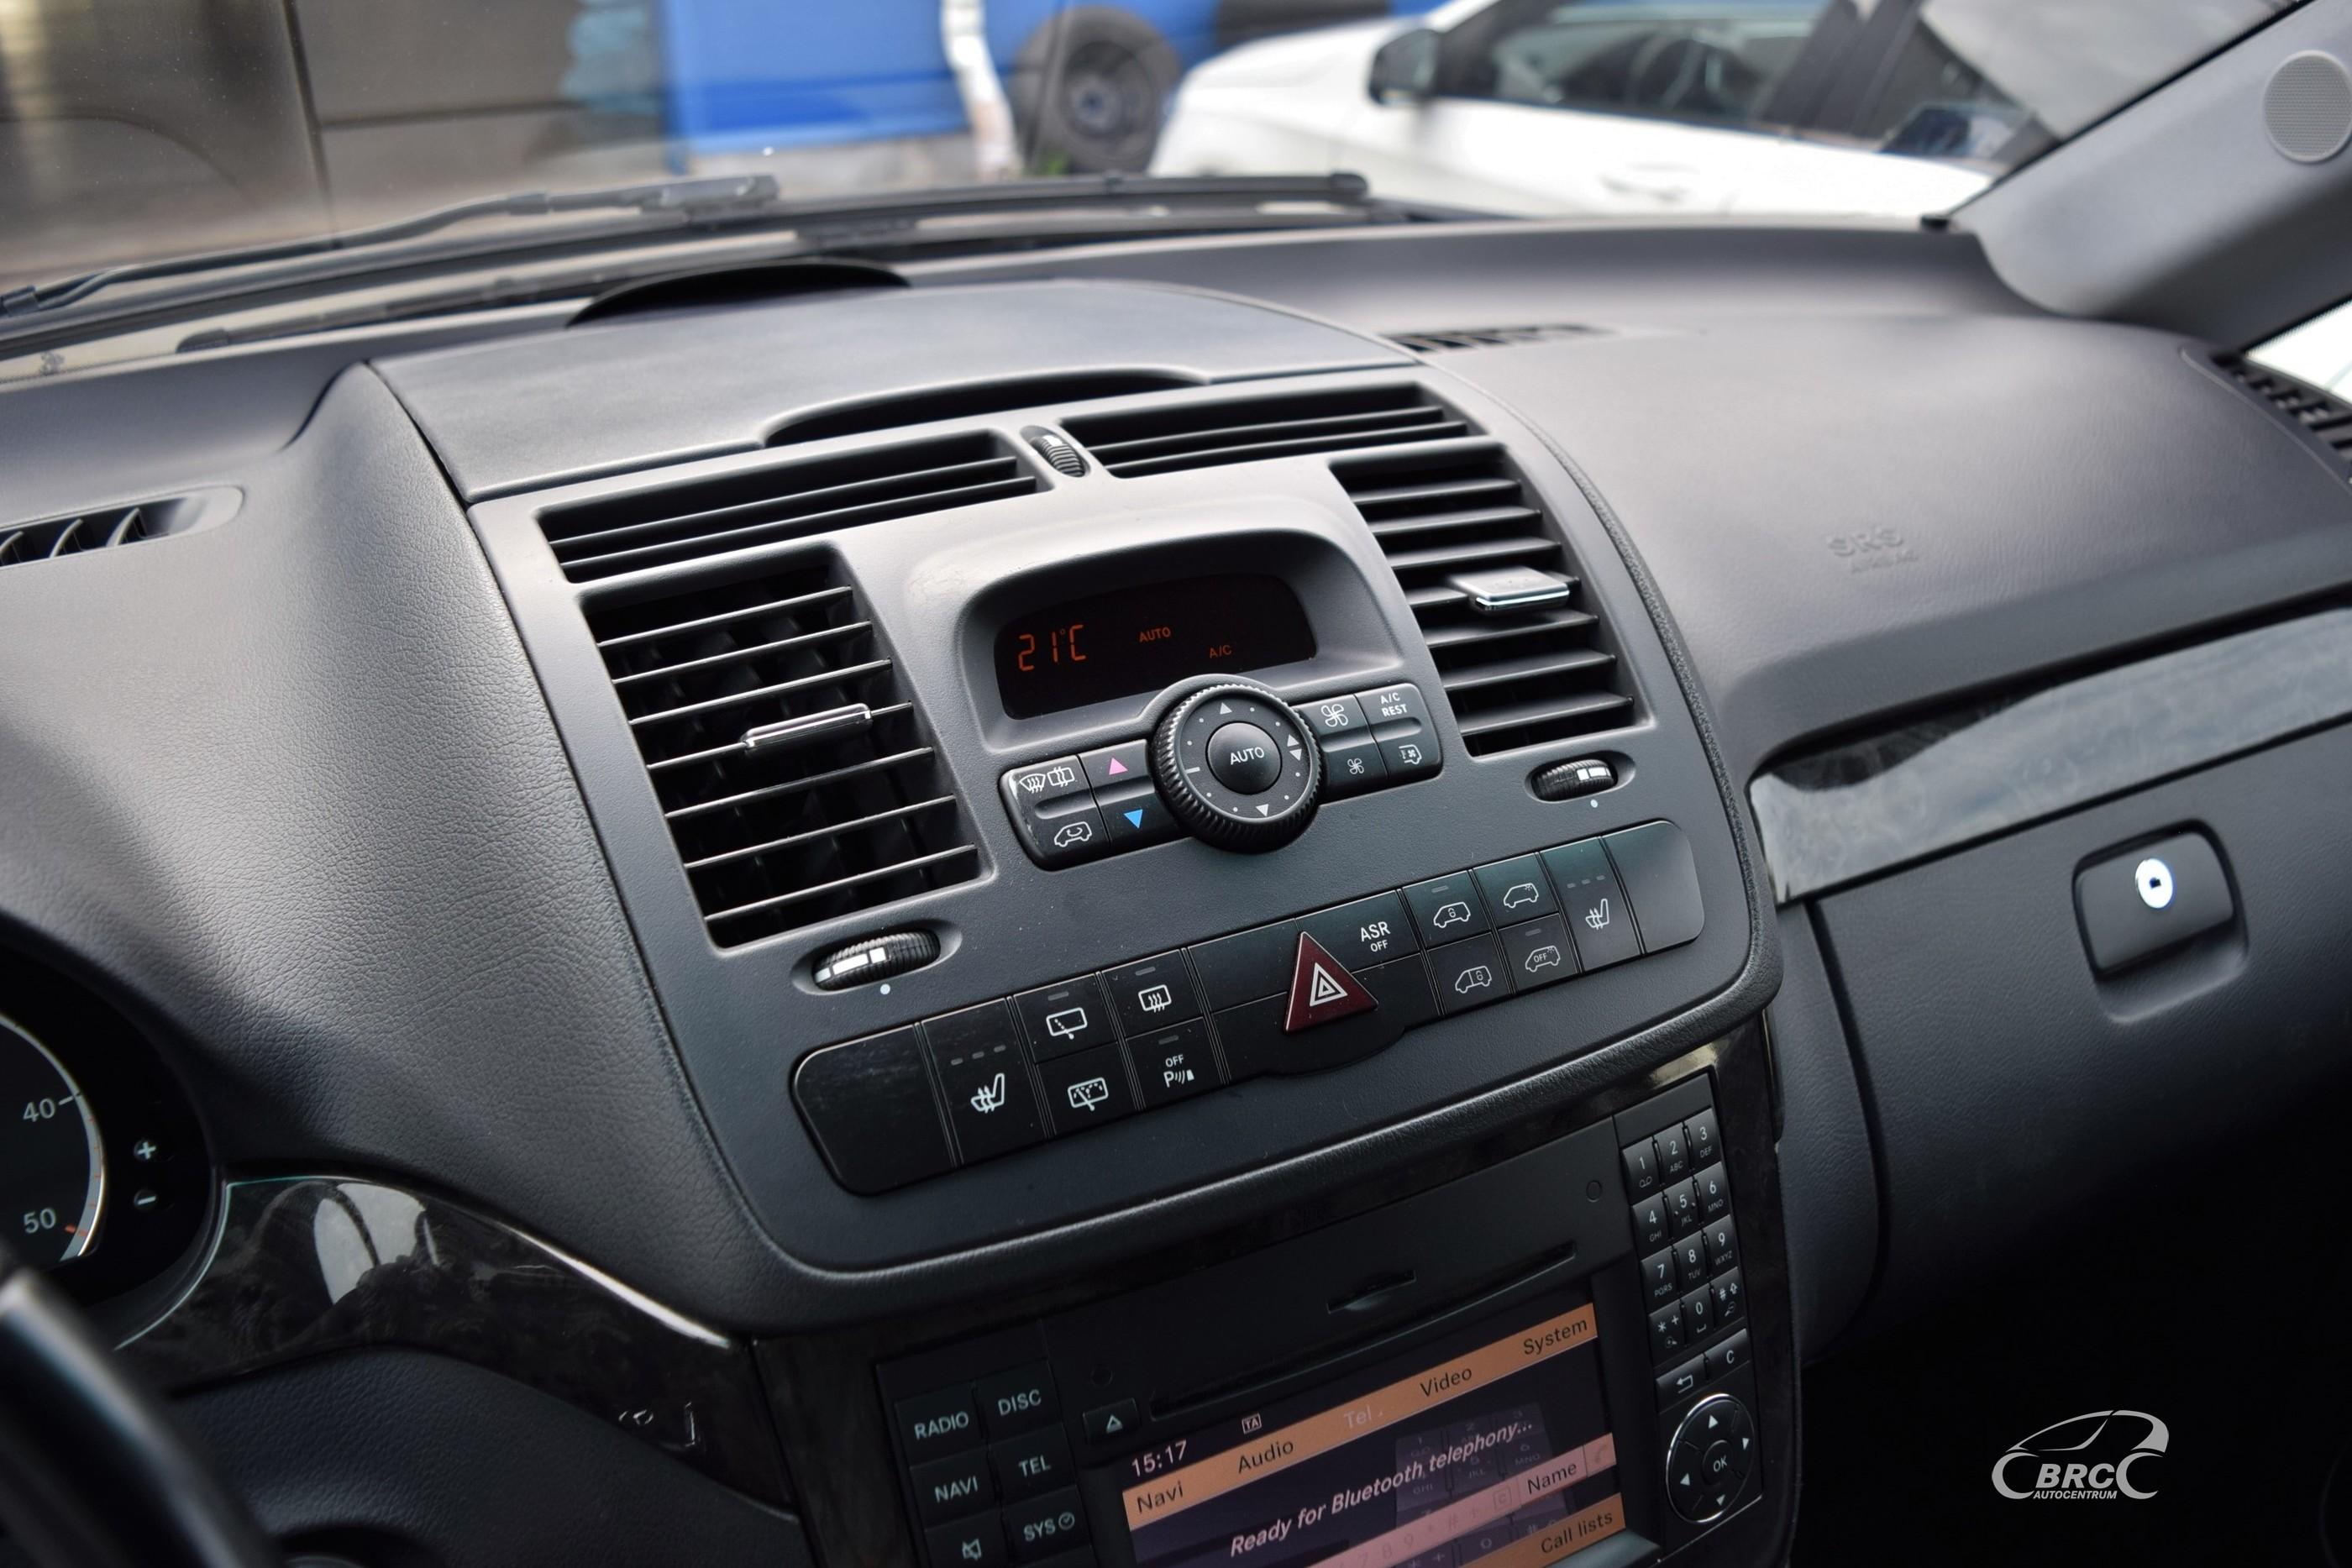 Mercedes-Benz Viano Ambiente V6 CDi A/T 6 seats